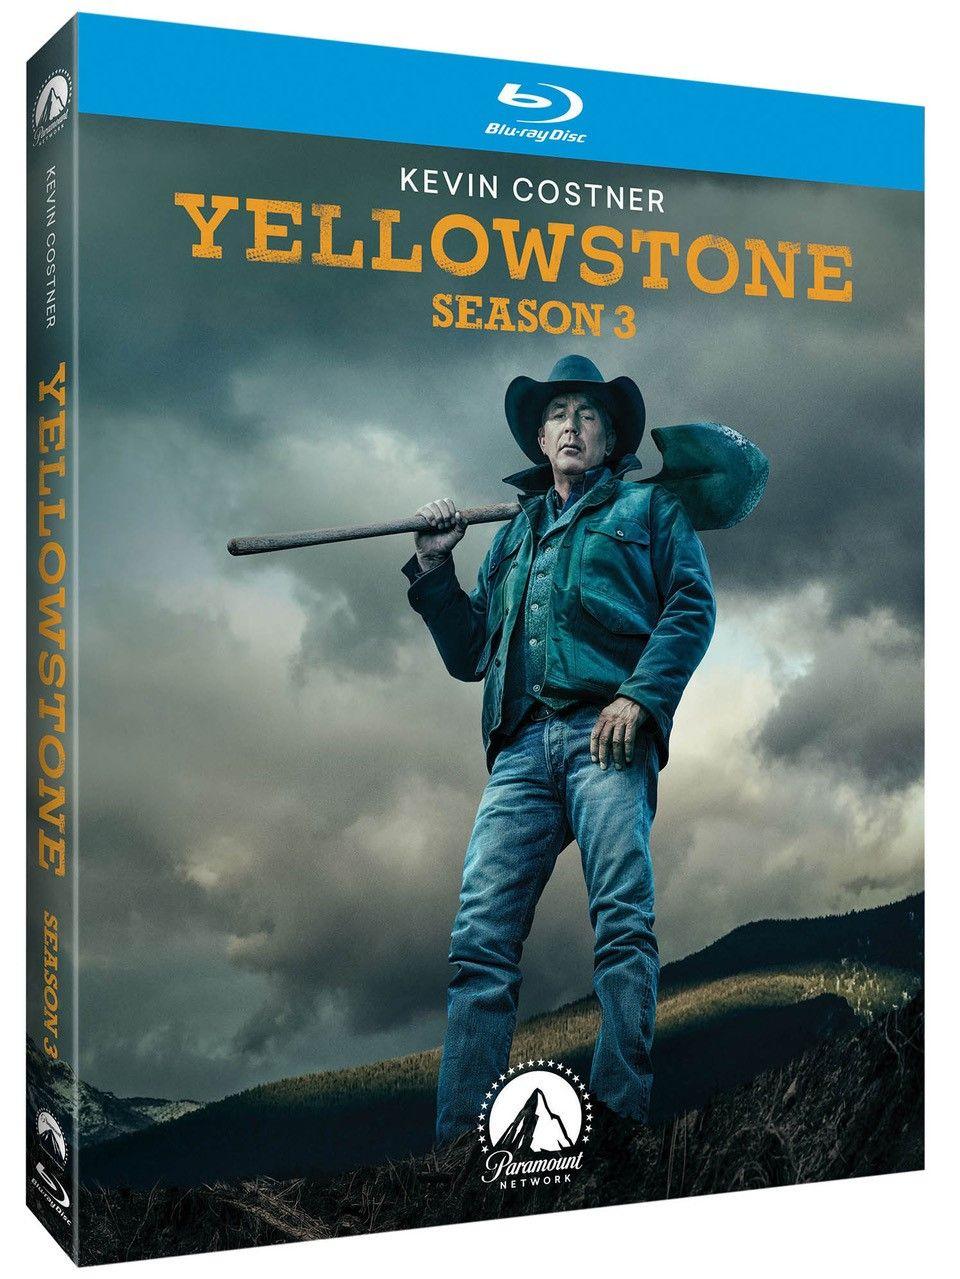 Yellowstone  Season 2 Blu-ray Review